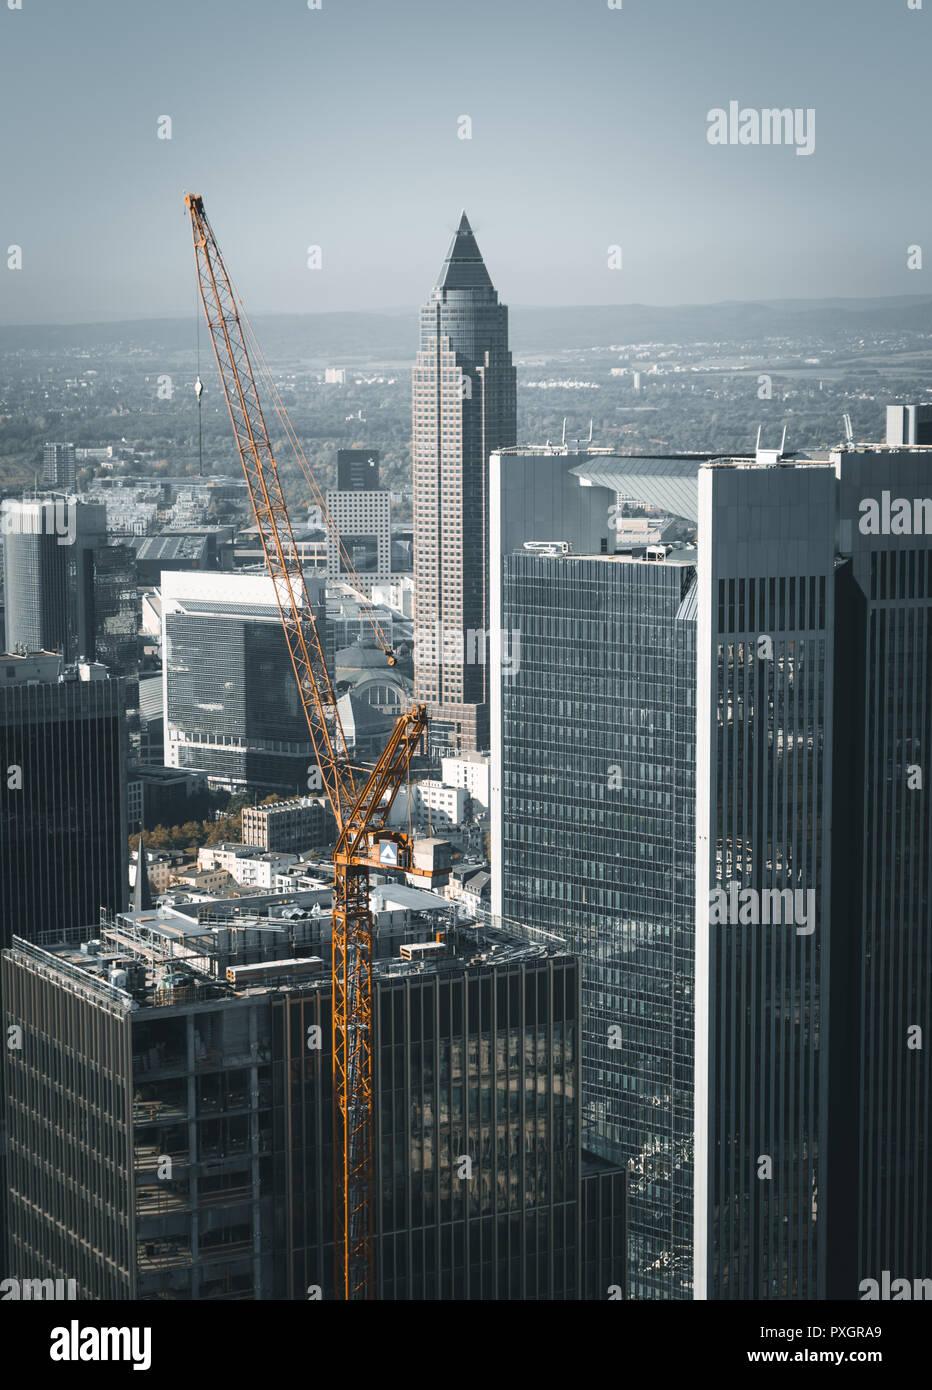 Frankfurt Messeturm Stock Photo